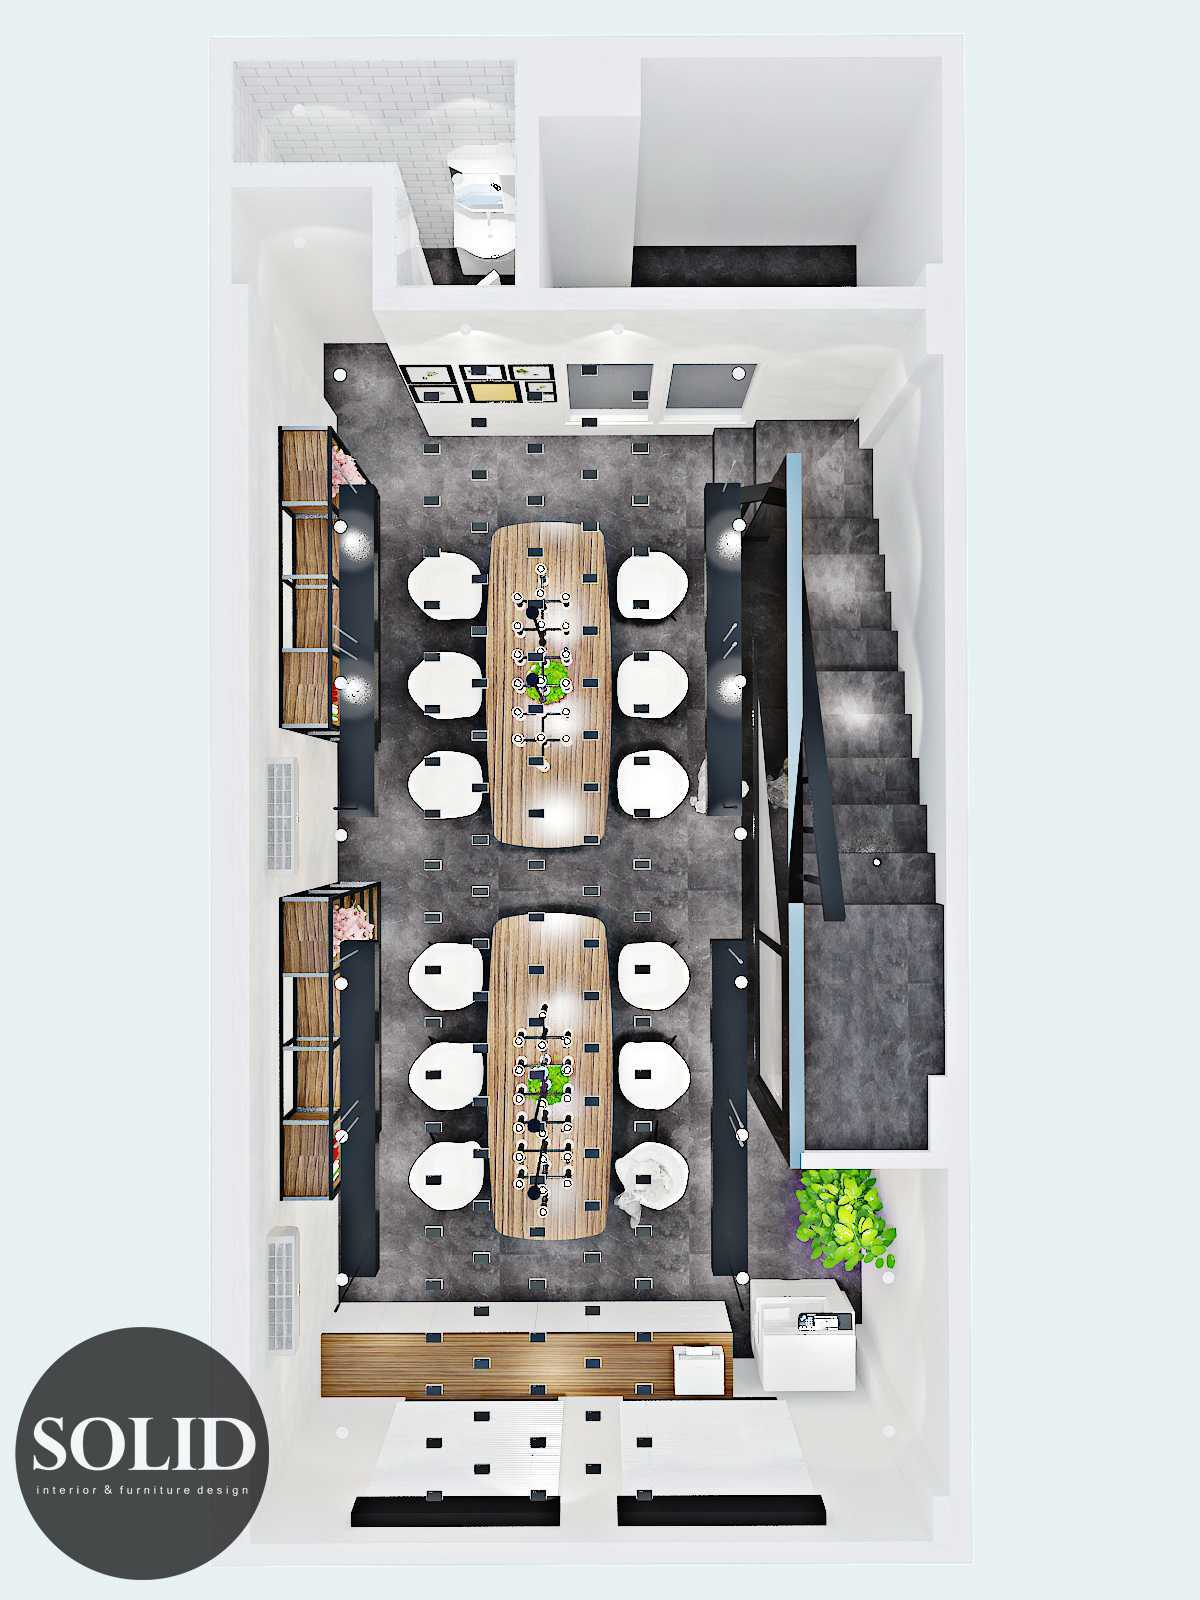 Solid Design Studio Mit Office - Pik Jl. Pantai Indah Kapuk, Rt.6/rw.2, Kamal Muara, Kec. Penjaringan, Kota Jkt Utara, Daerah Khusus Ibukota Jakarta, Indonesia Jl. Pantai Indah Kapuk, Rt.6/rw.2, Kamal Muara, Kec. Penjaringan, Kota Jkt Utara, Daerah Khusus Ibukota Jakarta, Indonesia Solid-Design-Studio-Mit-Office-Pik   86676